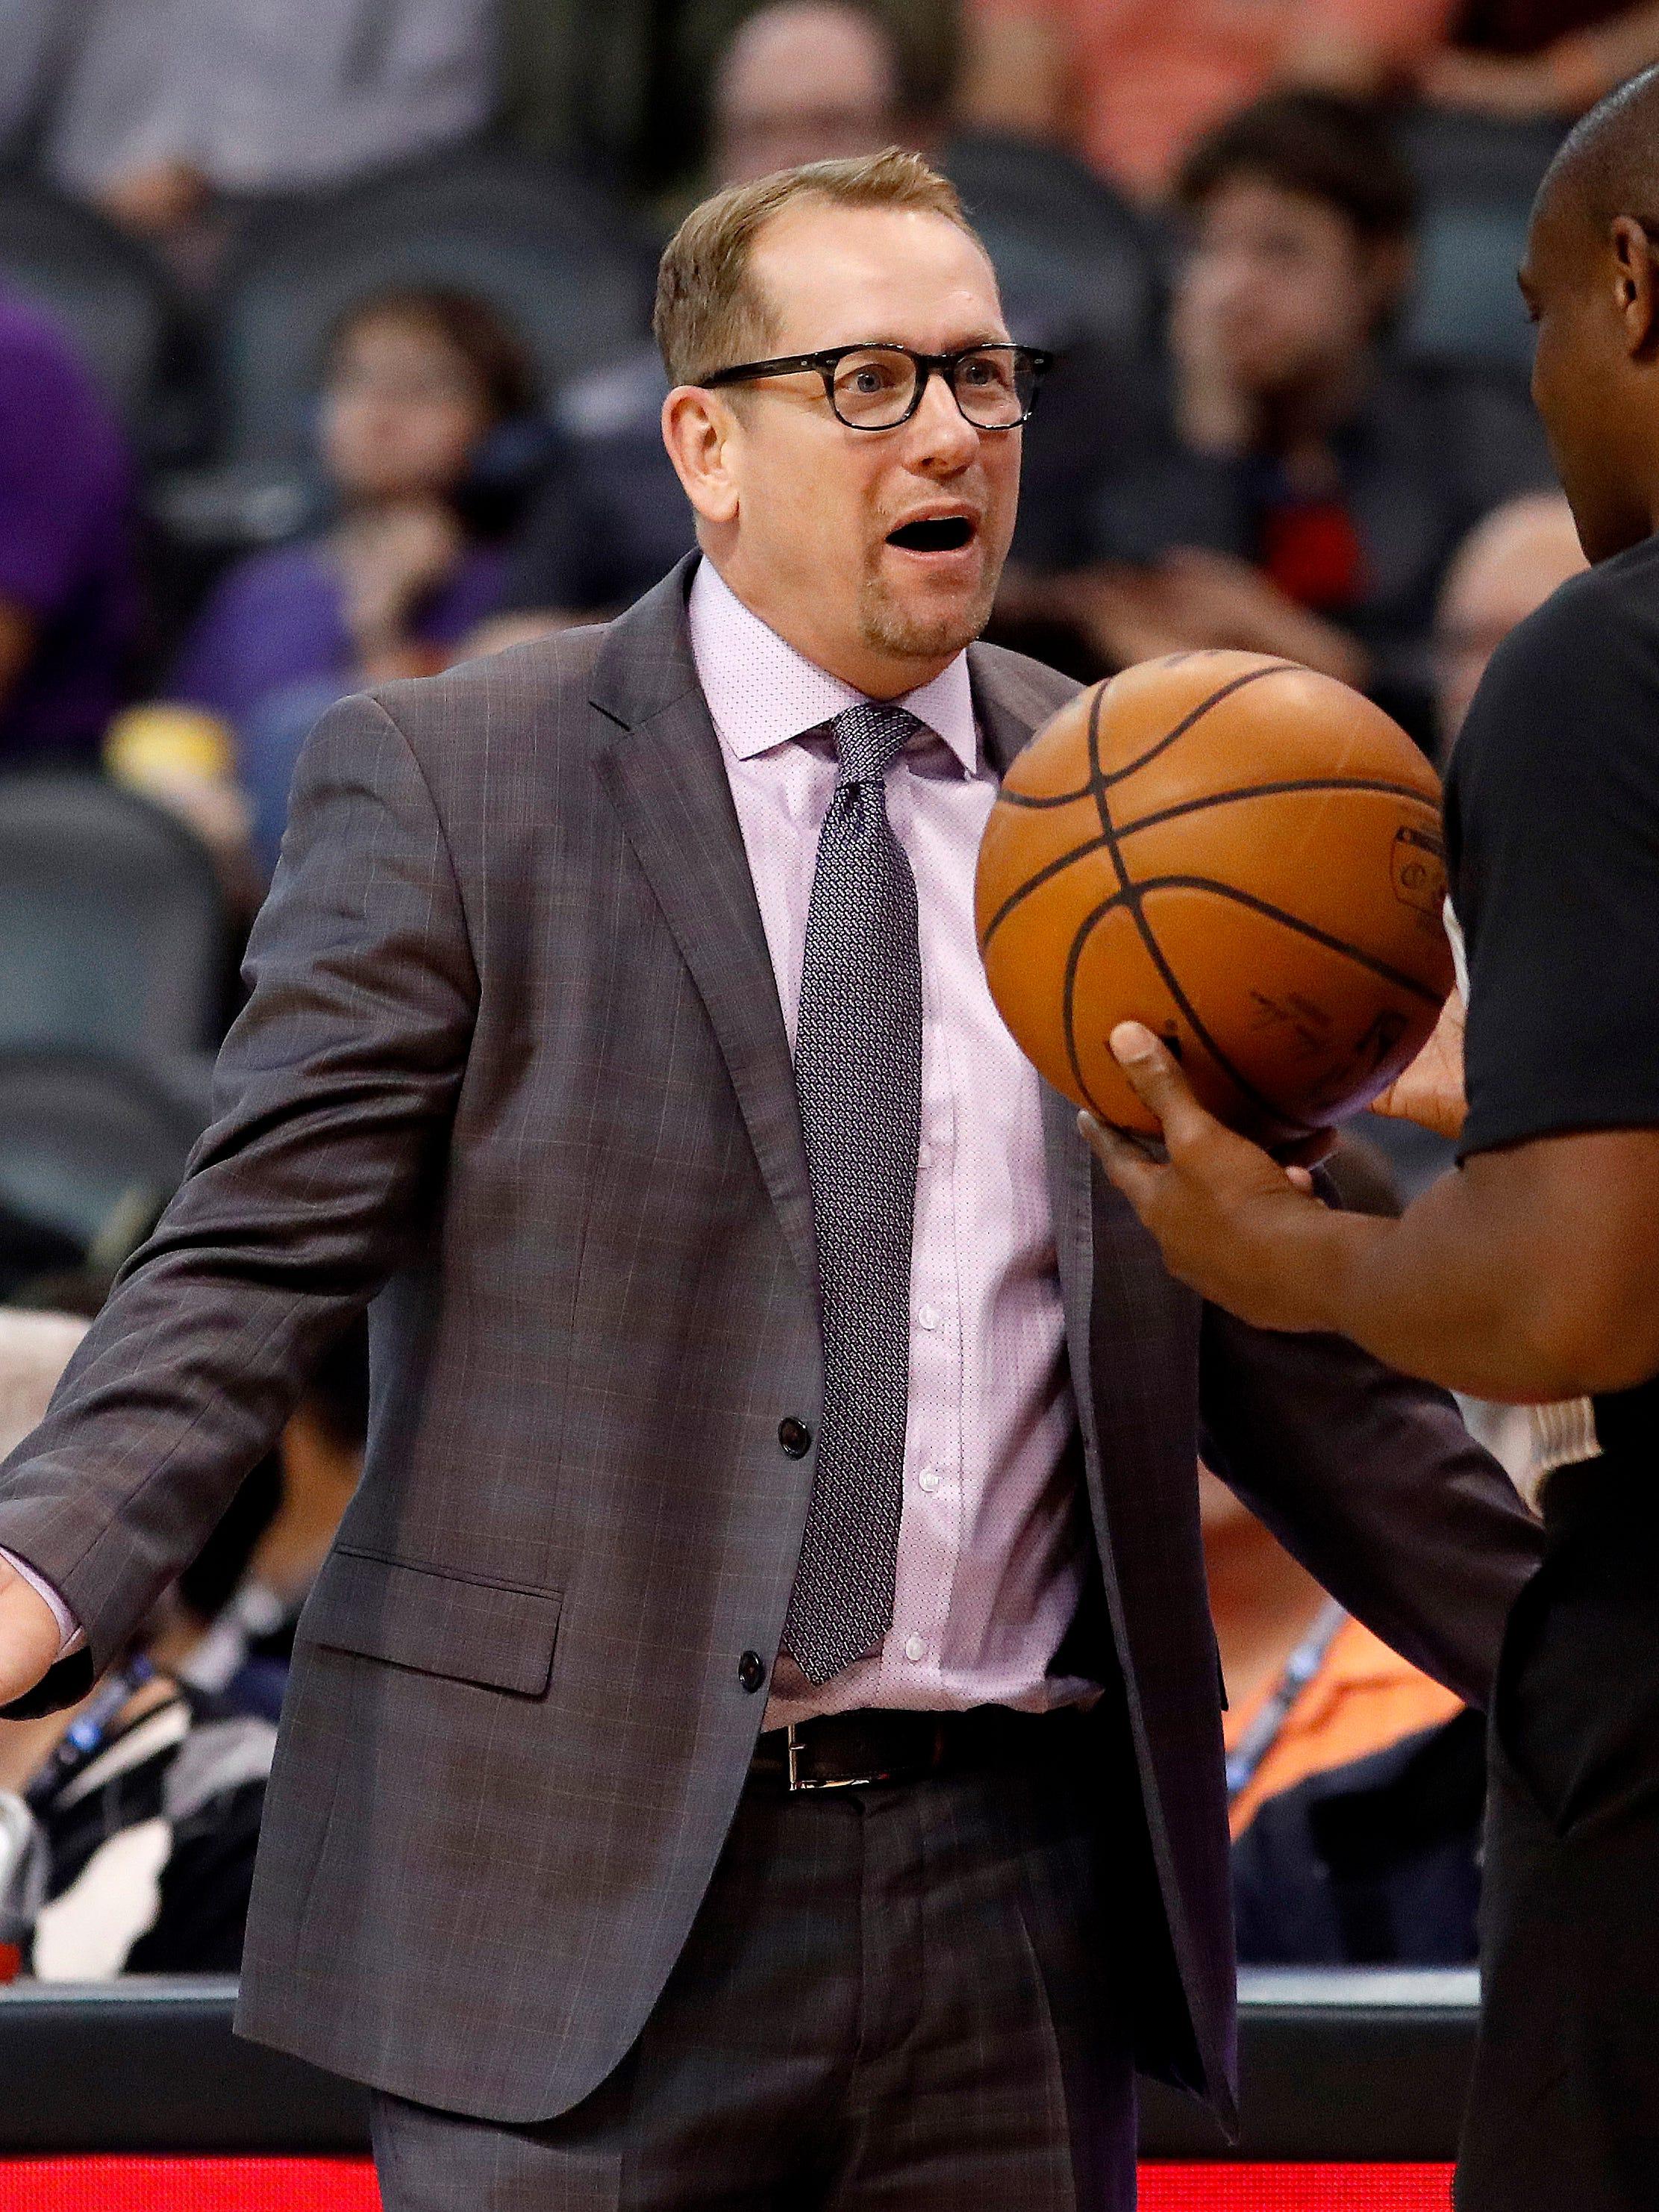 Toronto Raptors head coach Nick Nurse talks with referee Tony Brown (6) during the second half of an NBA basketball game against the Phoenix Suns, Friday, Nov. 2, 2018, in Phoenix. (AP Photo/Matt York)